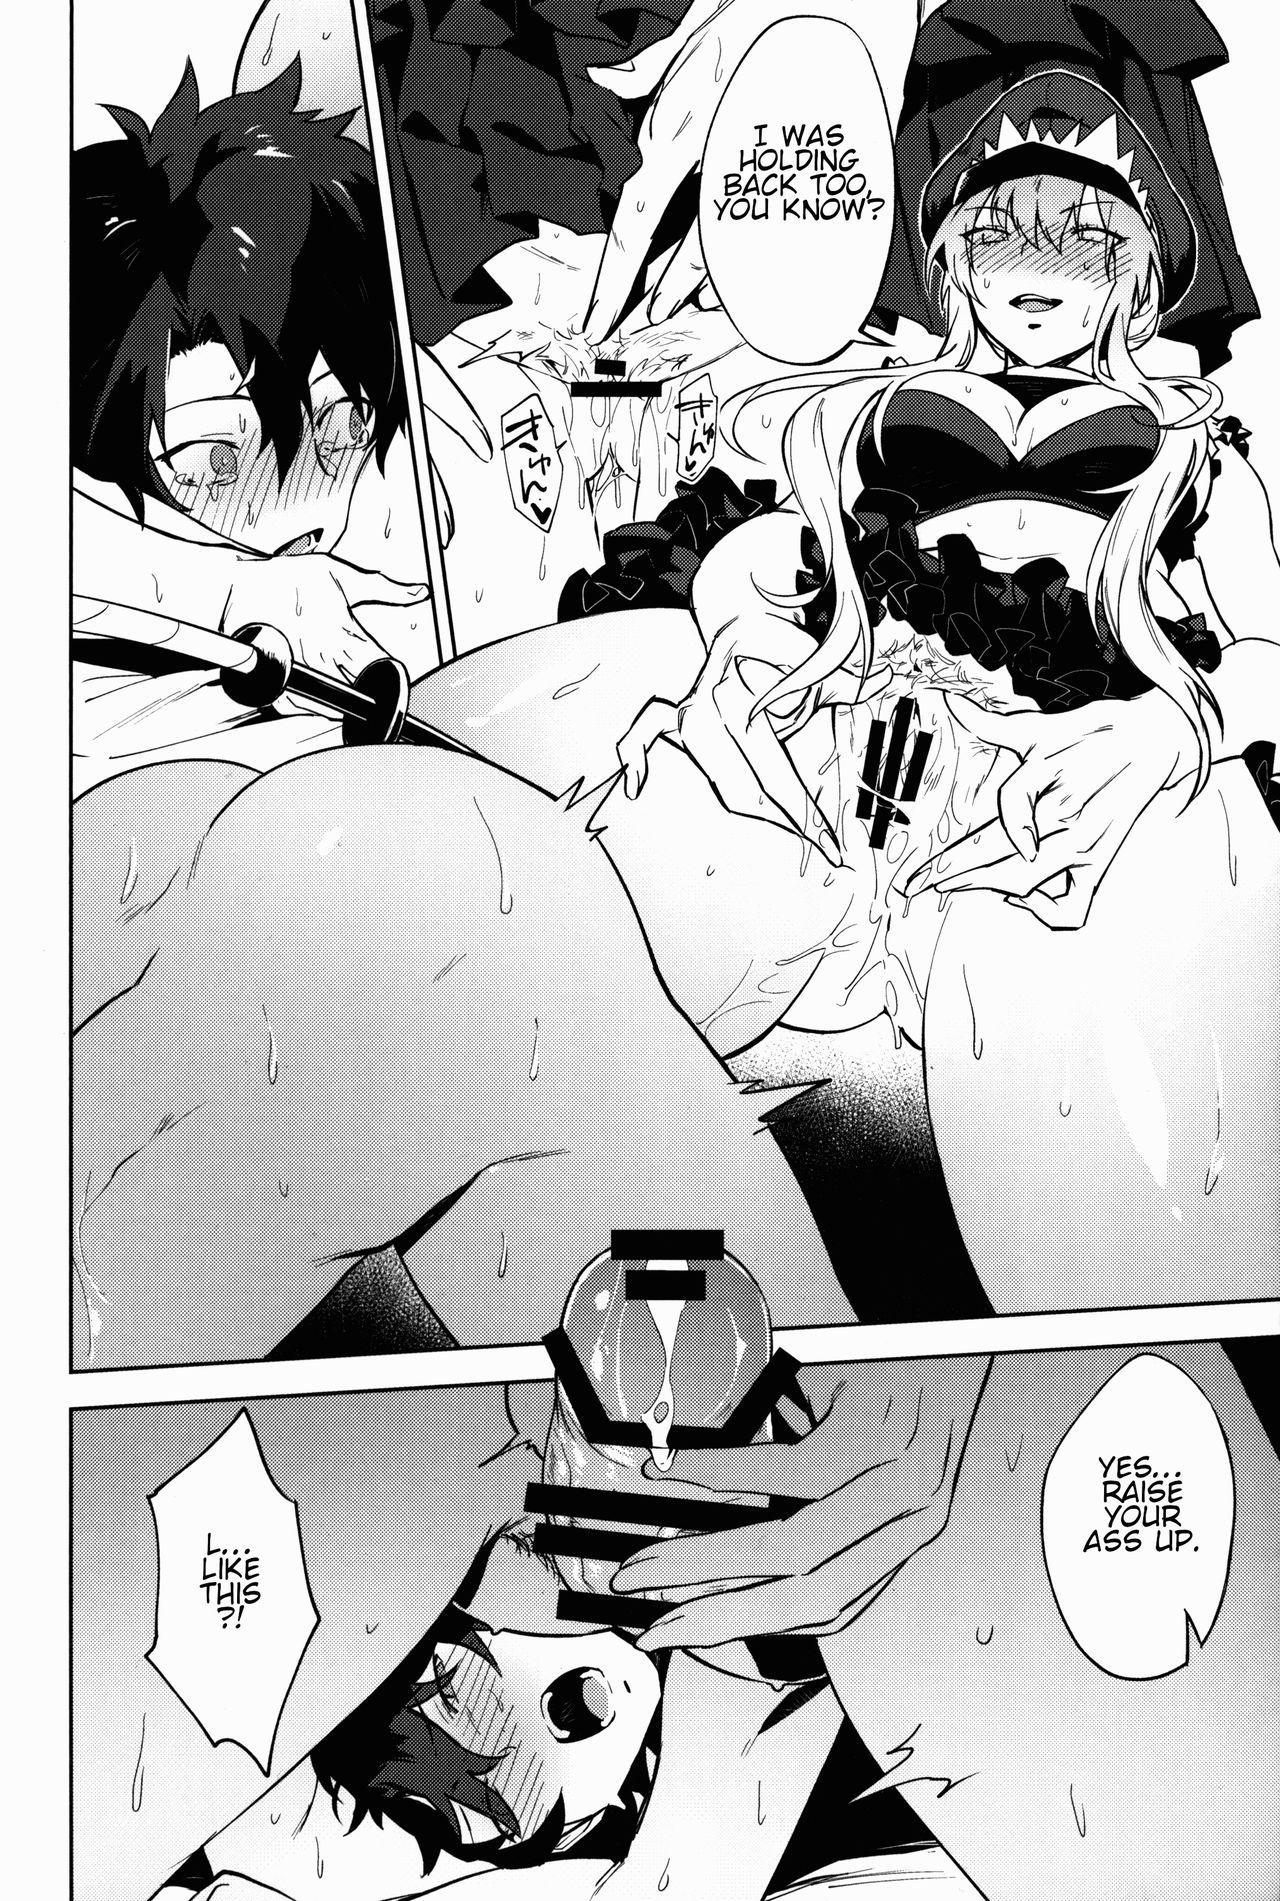 Gokuchou Medb to Joou no Shitsuke | Warden Medb and The Queen's Discipline 19